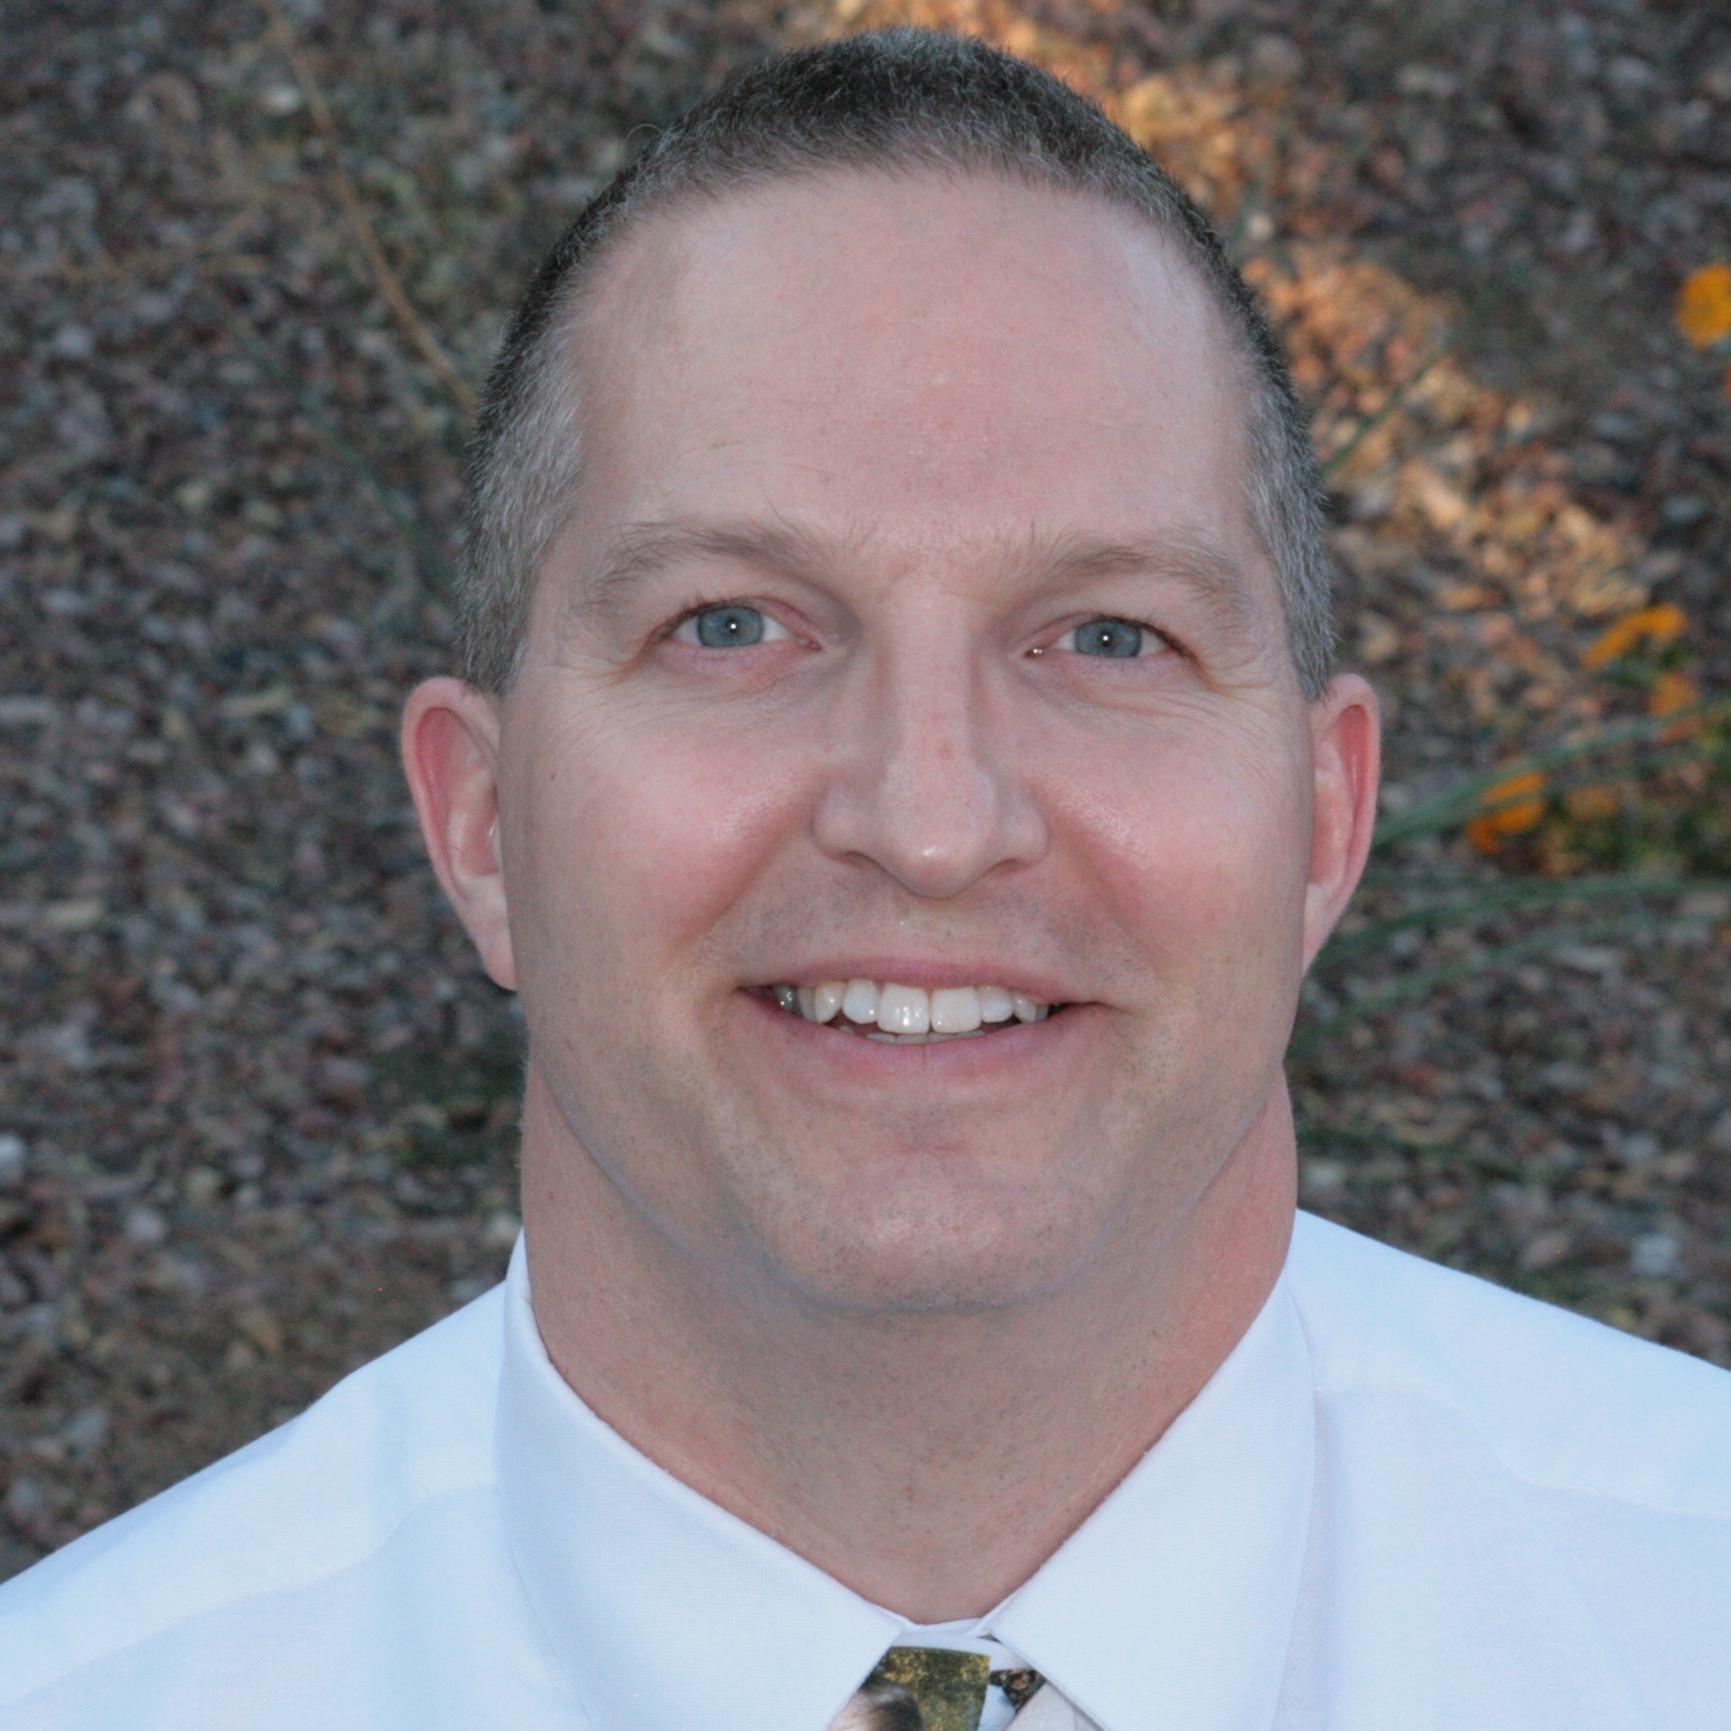 Vaughn Hazen, Director, IT Security & CISO at Freeport-McMoRan